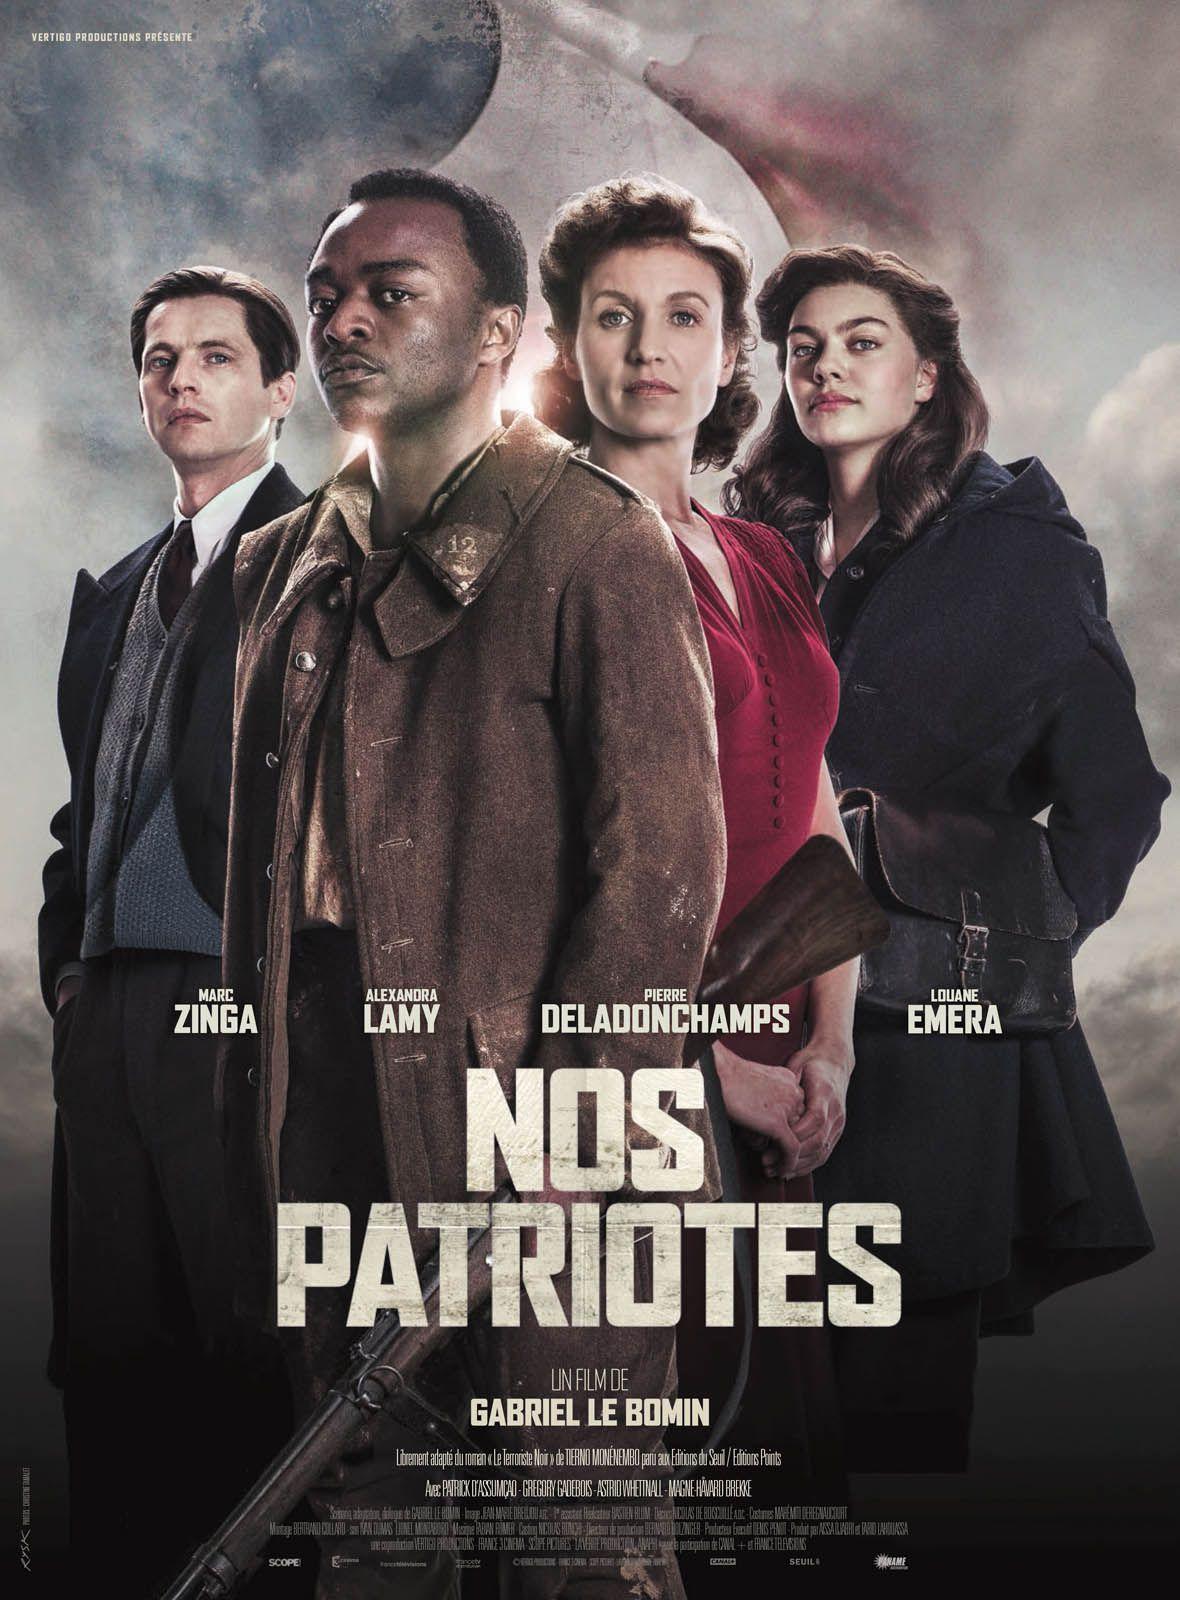 Nos patriotes - Film (2017)